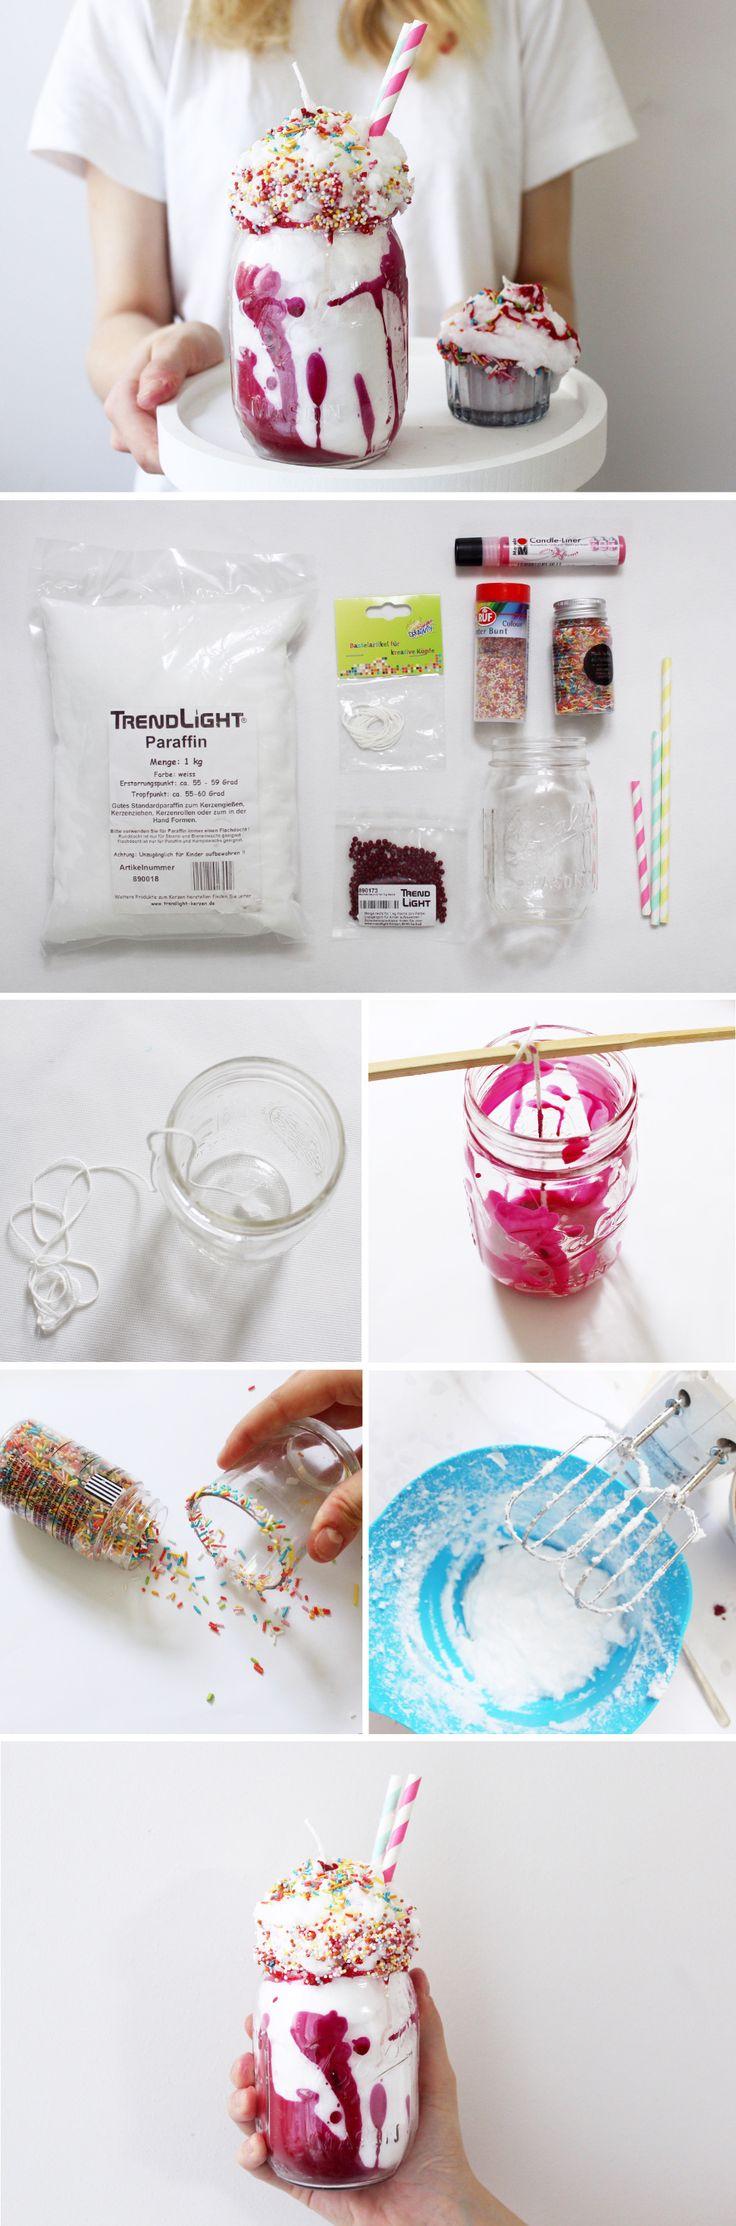 DIY Kerze in Milchshake-Form gießen